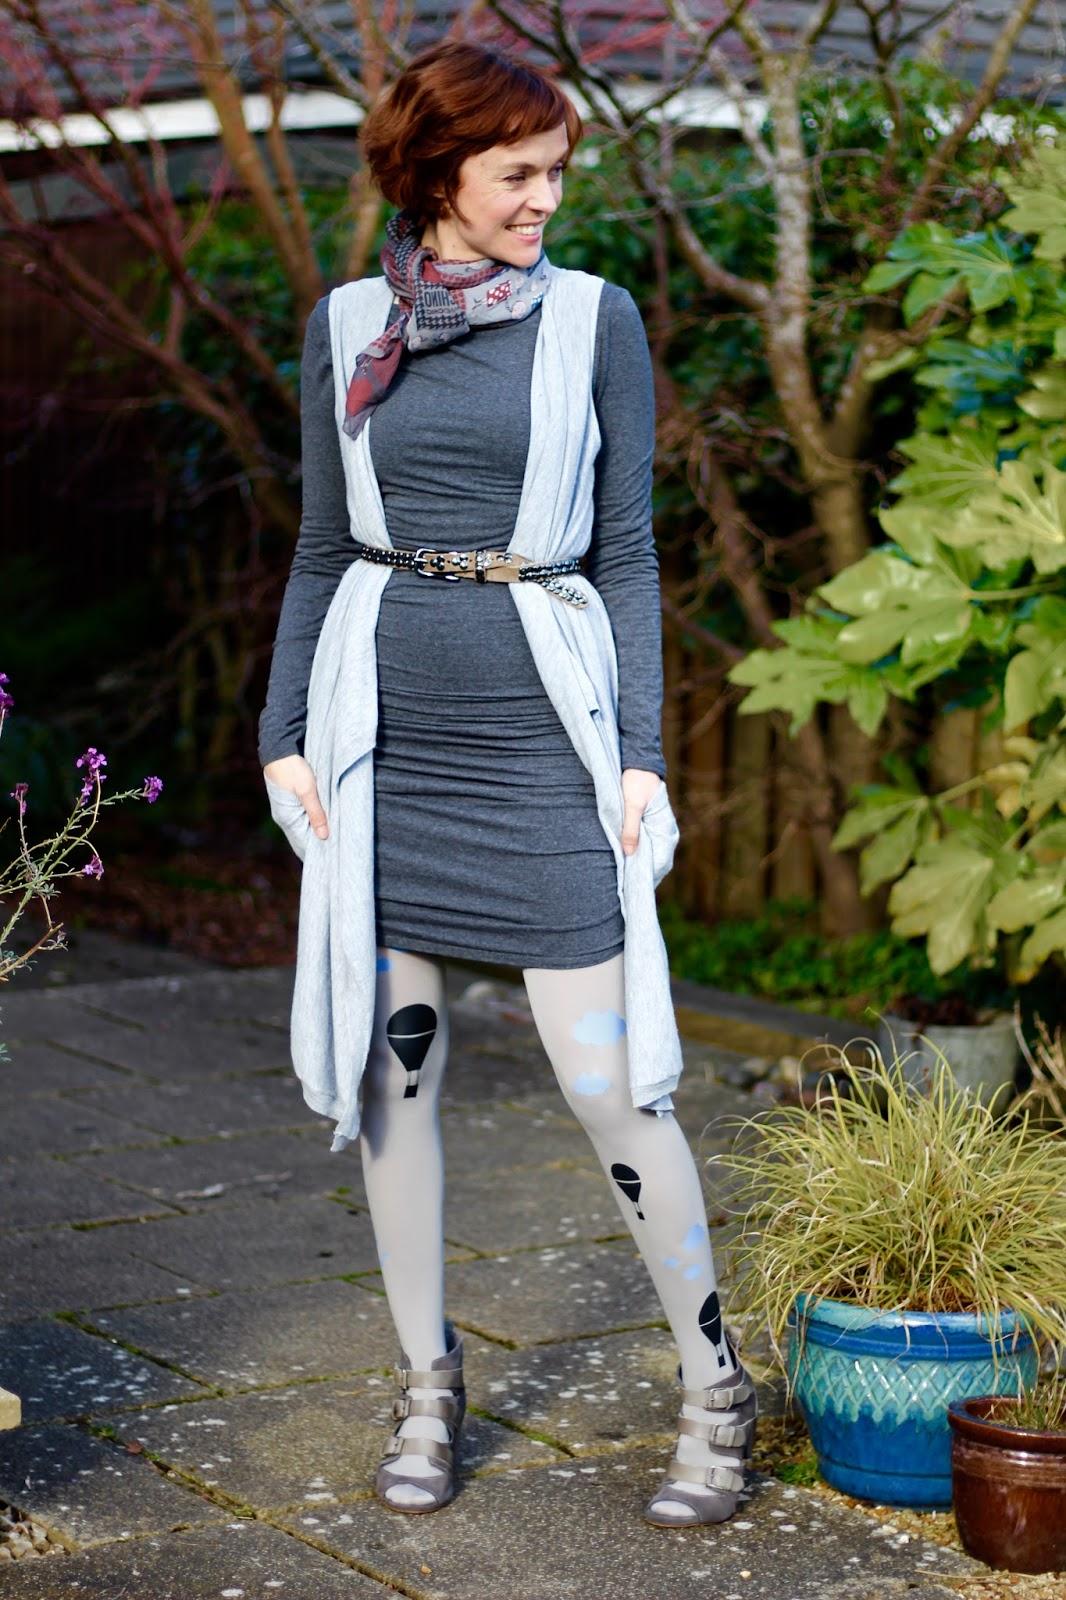 Boring Shades of Grey | Plain T-shirt Baukjen Dress & Fun Zohara BalloonTights!